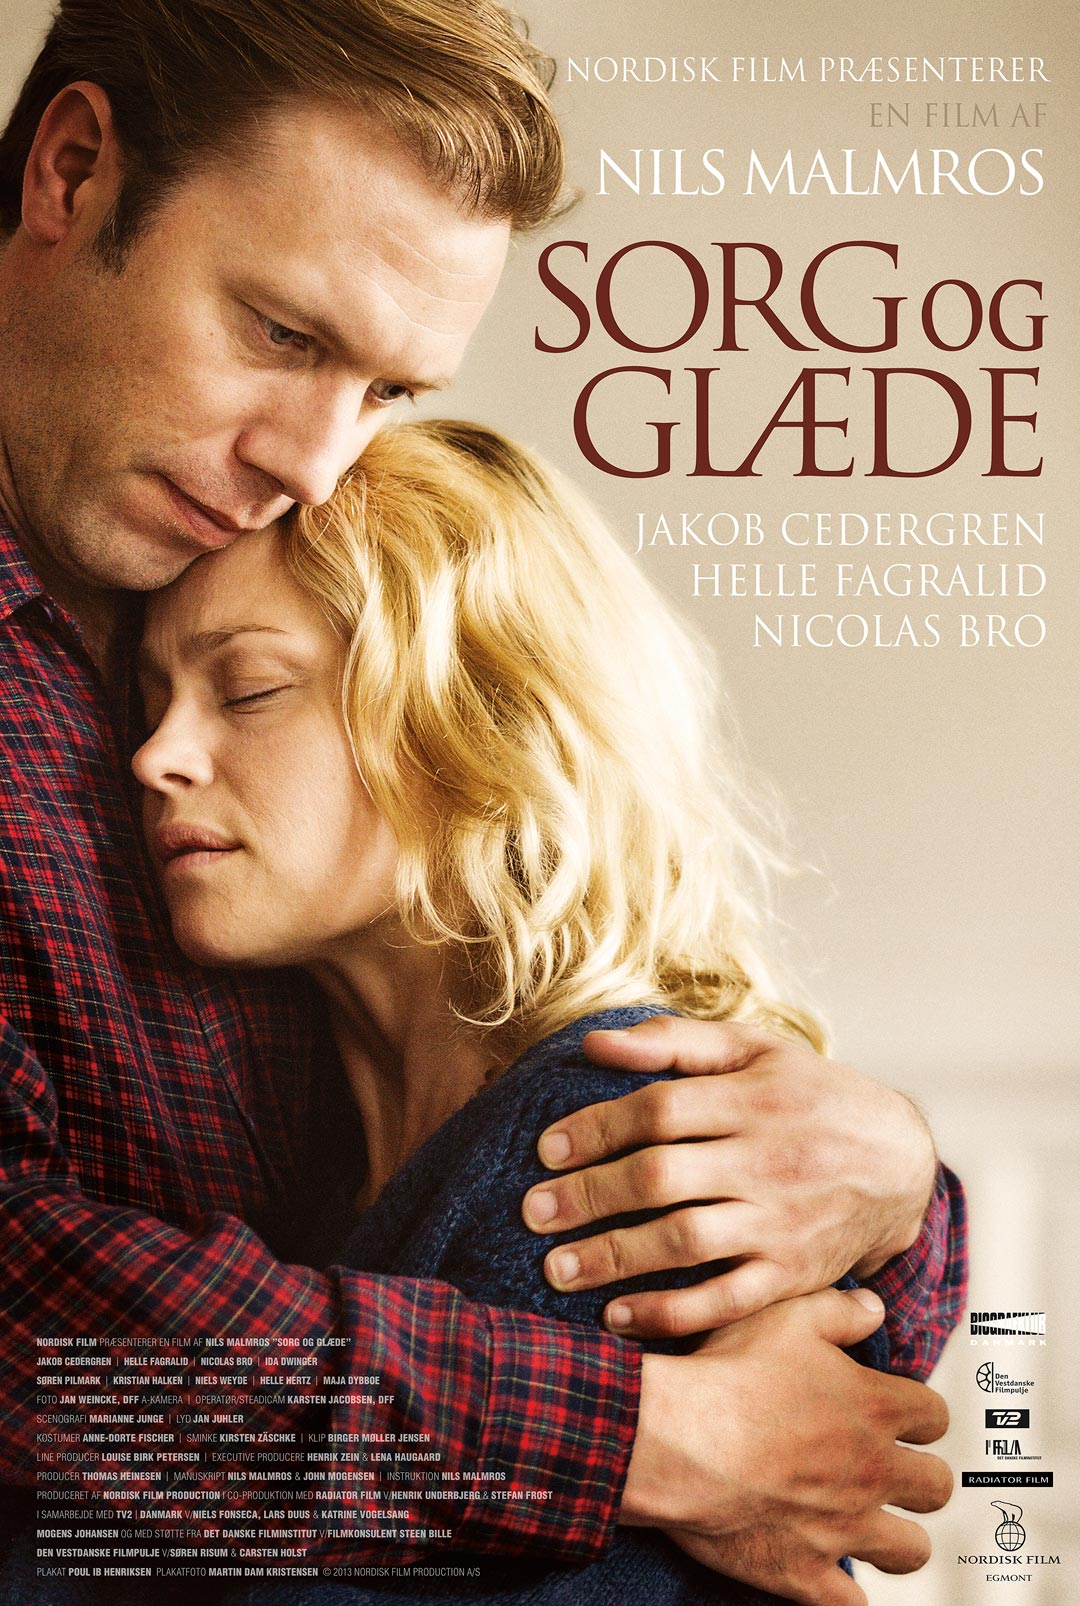 SorgOgGlaede.hd